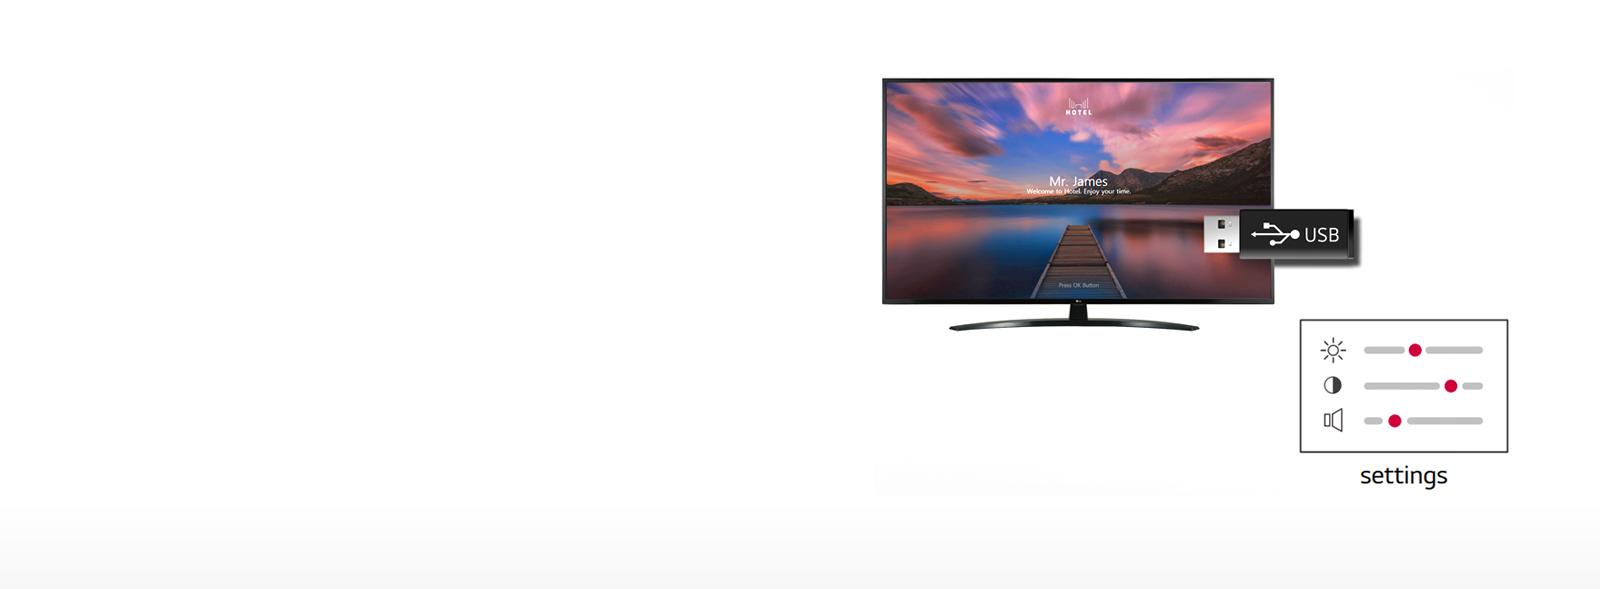 مشخصات تلویزیون 49 اینچ ال جی مدل 49UT661